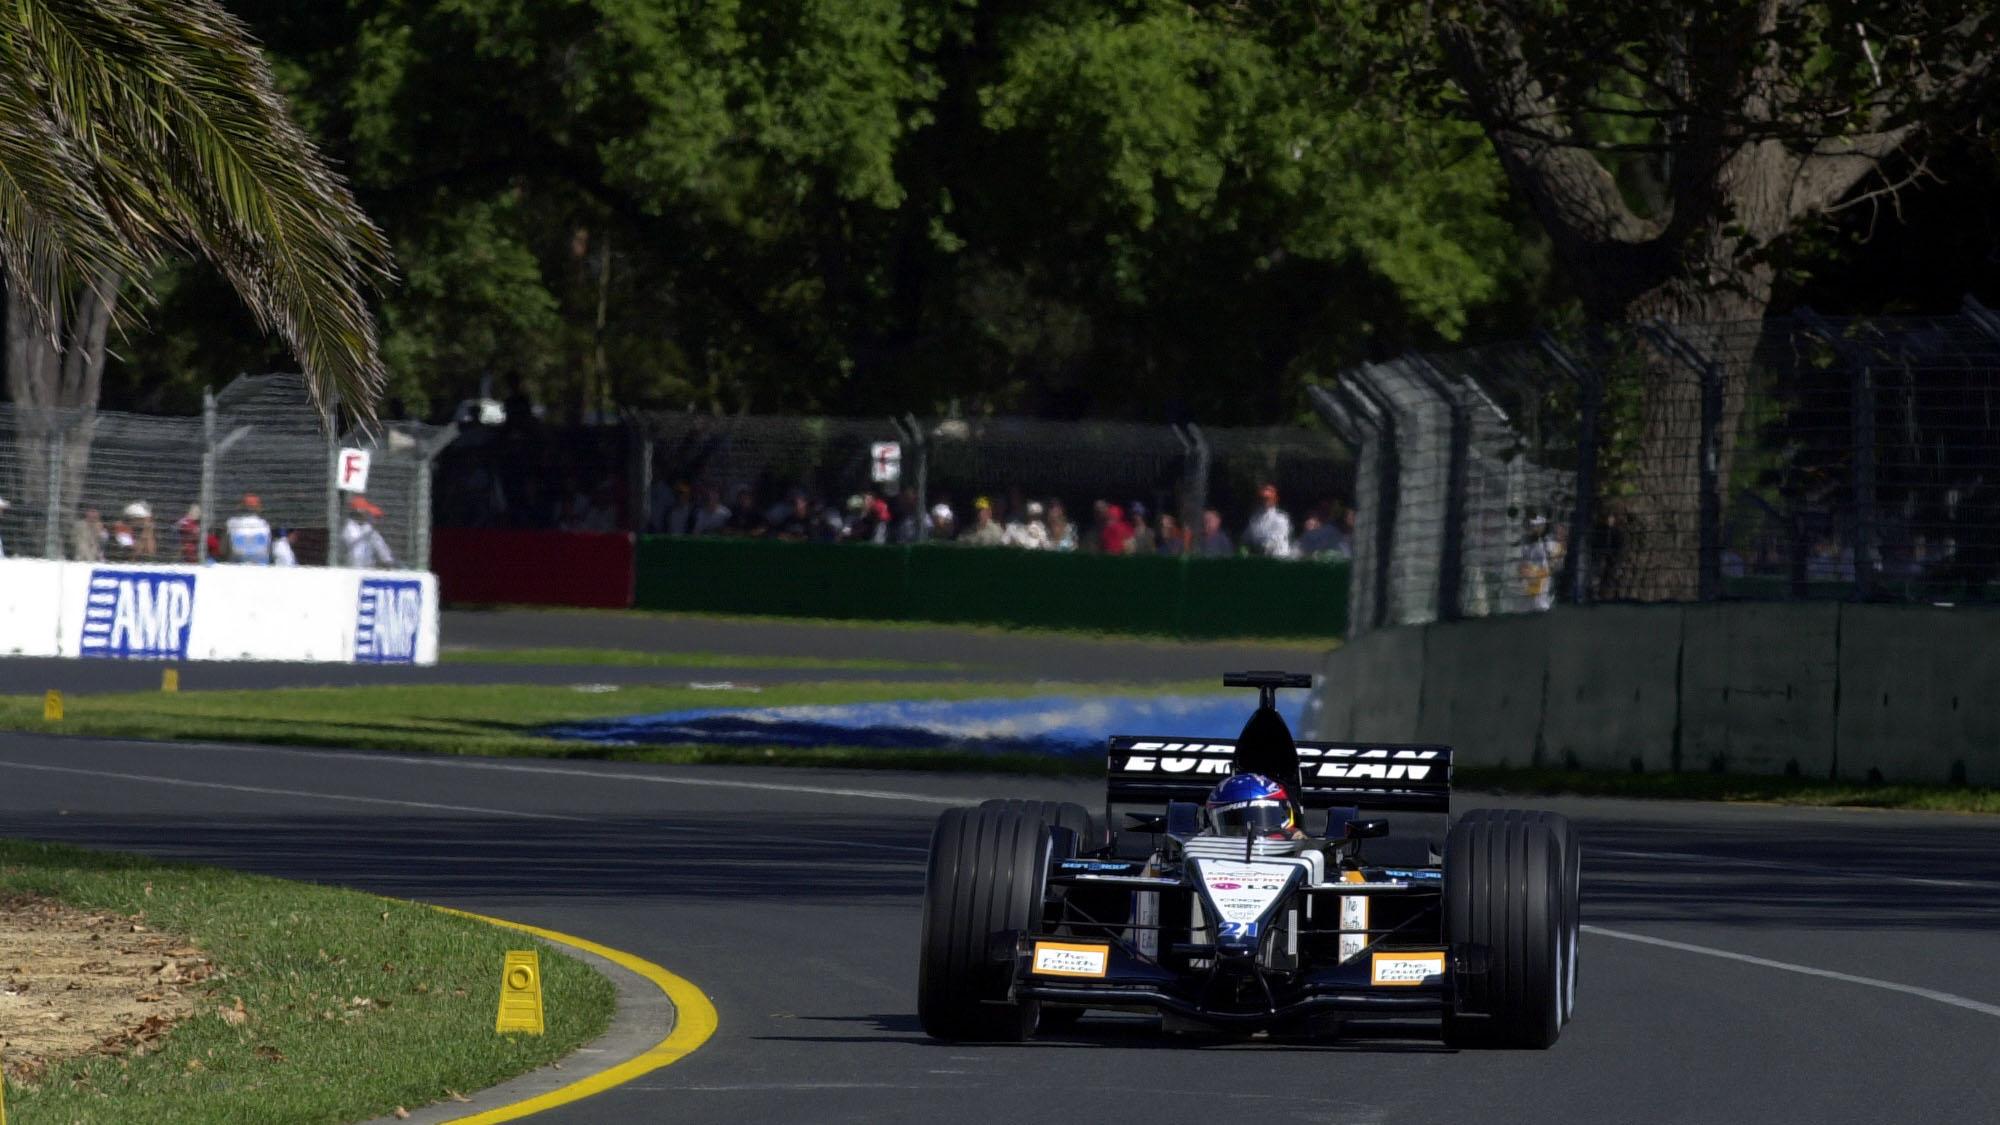 AUTO - F1 2001 - AUSTRALIAN GRAND-PRIX 010304 - MELBOURNE - PHOTO: ERIC VARGIOLU / DPPI FERNANDO ALONSO (SPA) / EUROPEAN MINARDI